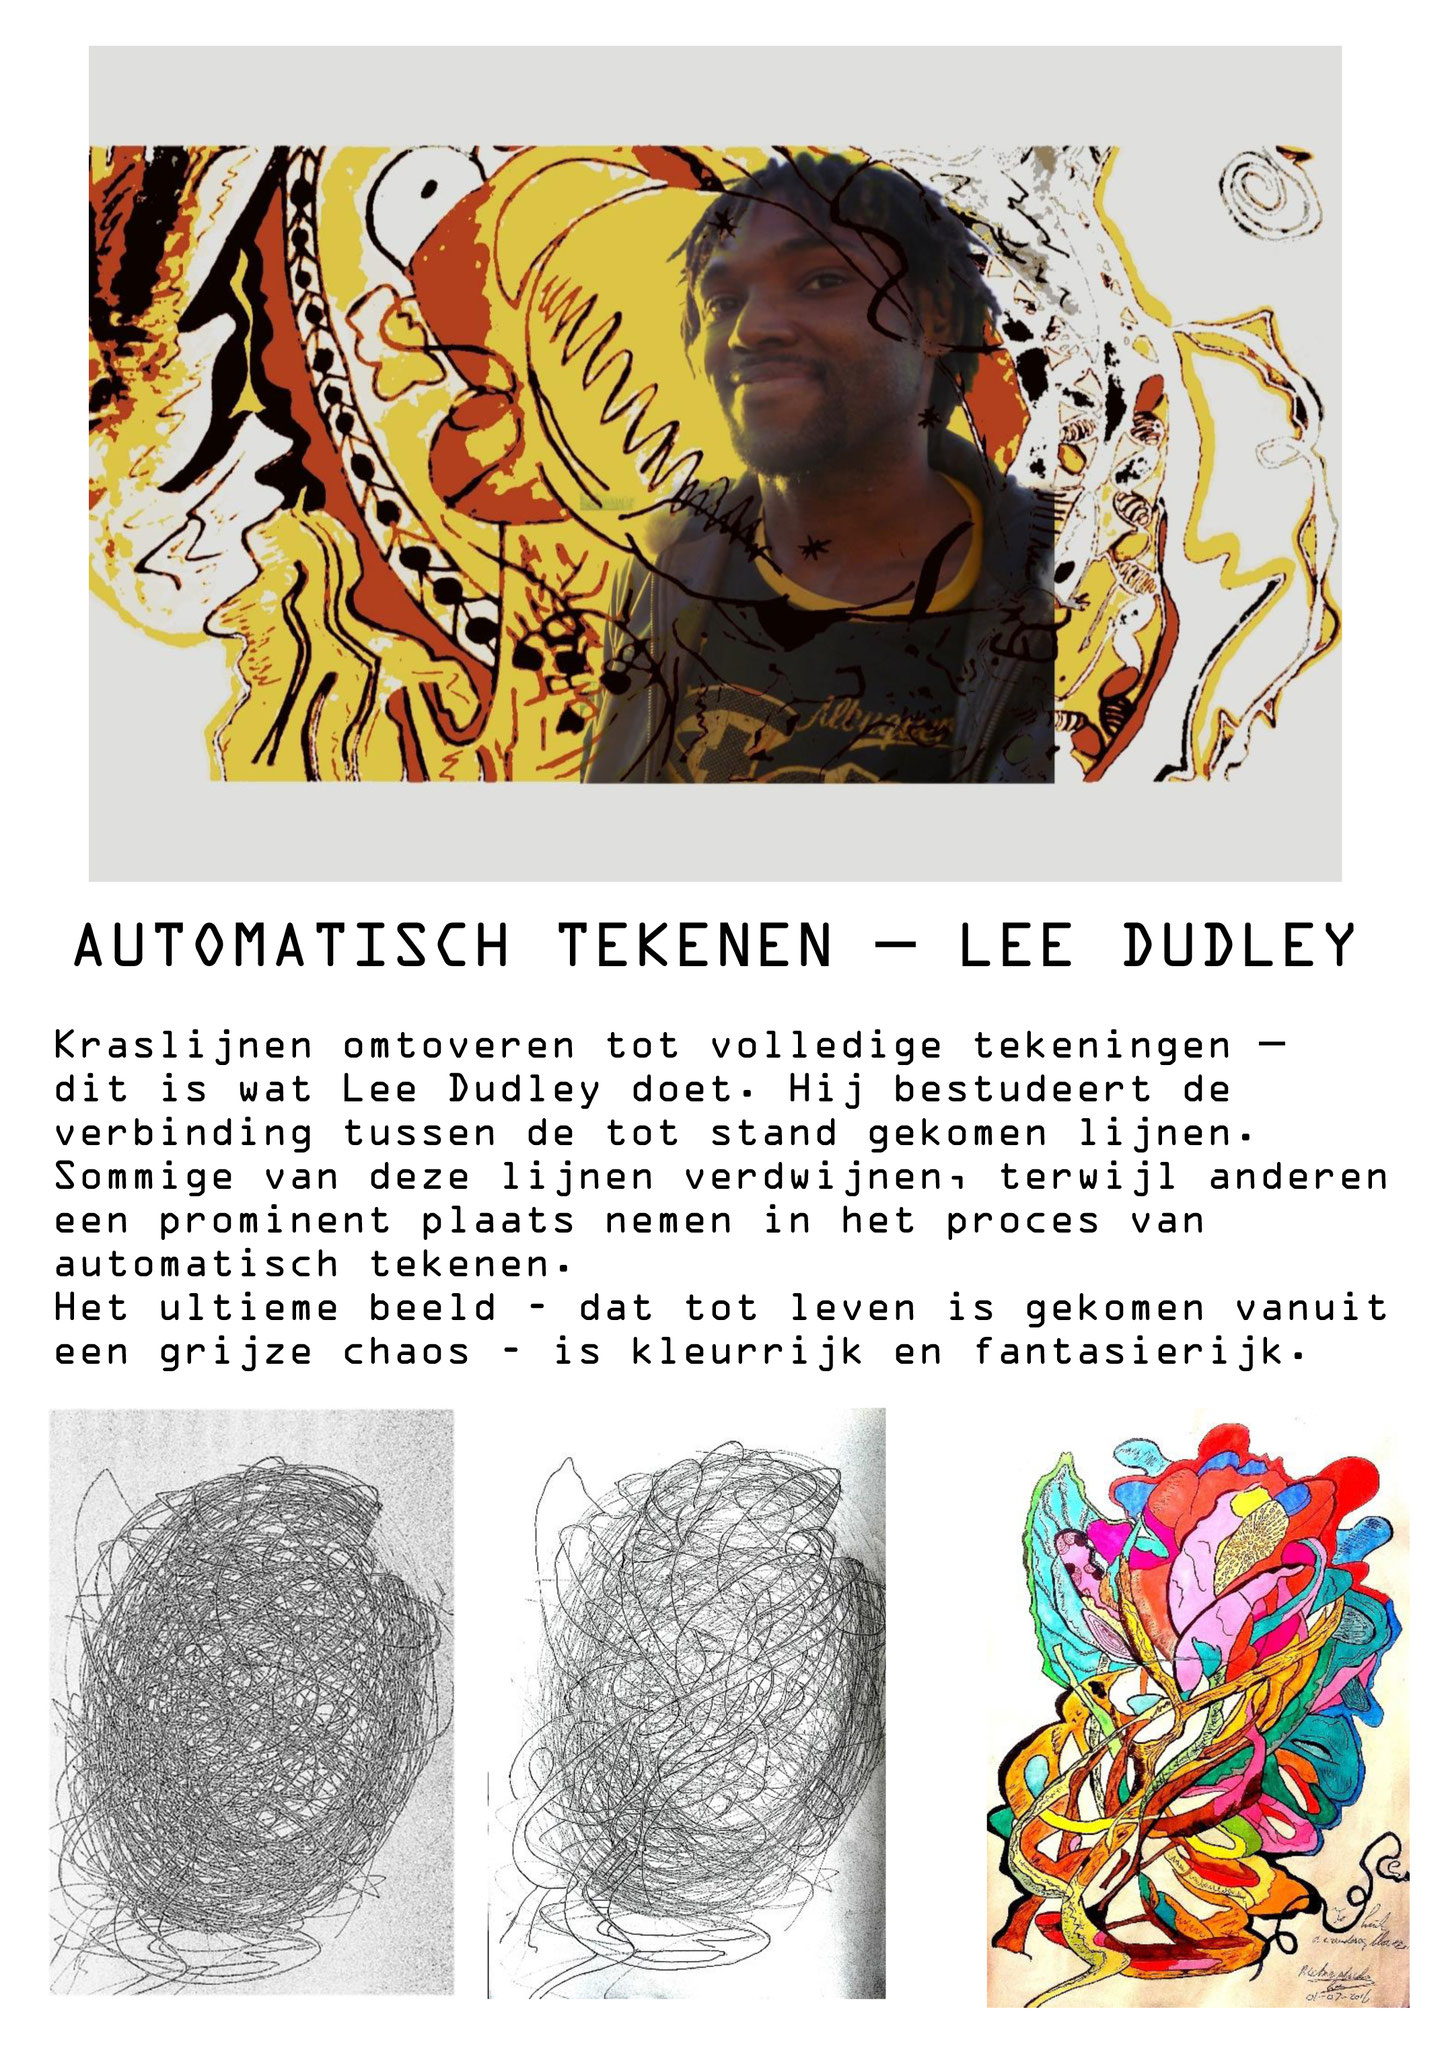 http://metamorfiziks.blogspot.nl/